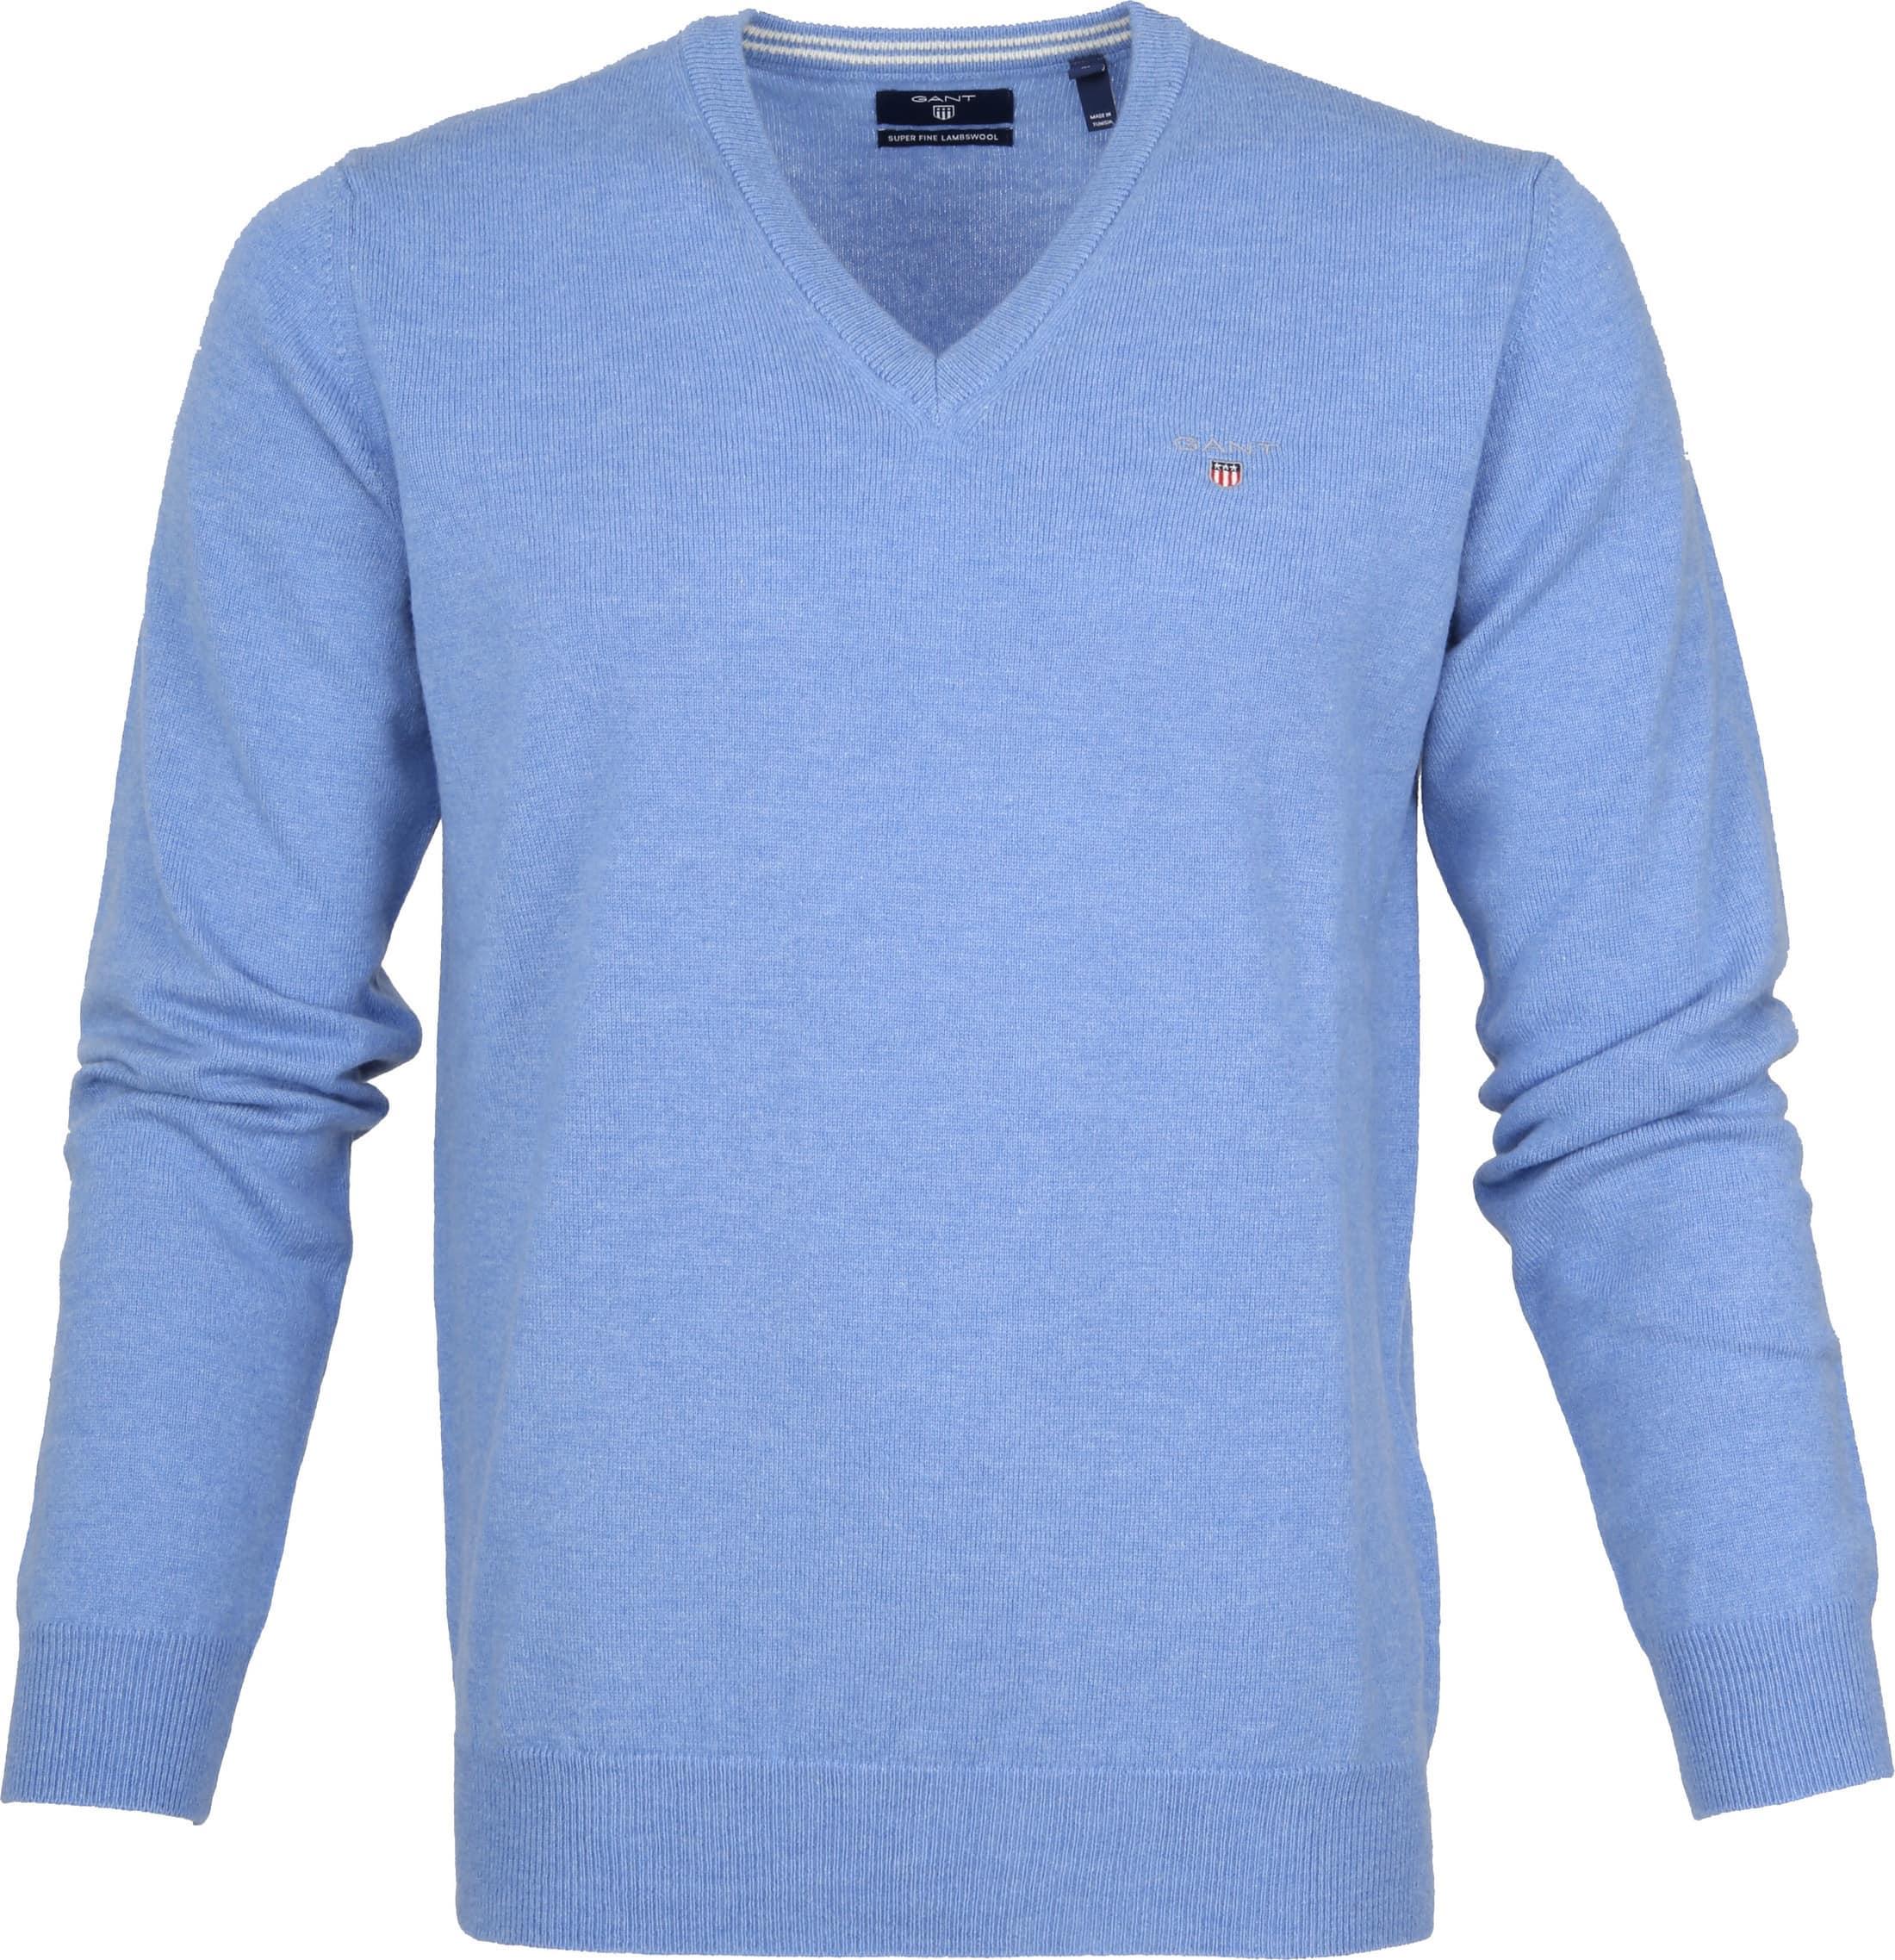 Gant Pullover Lammwolle Light Blue foto 0